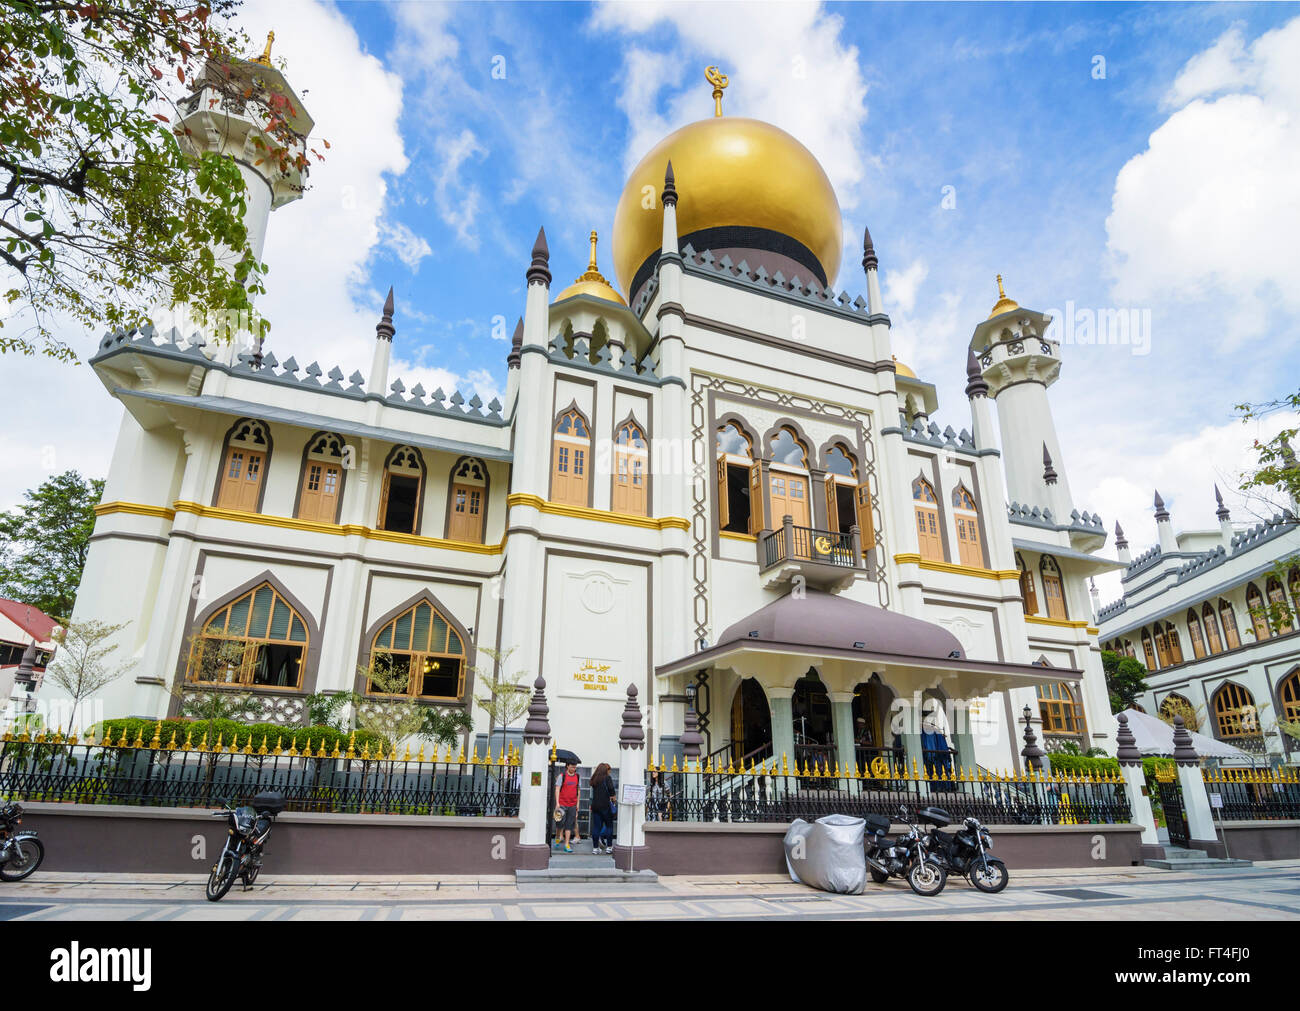 Masjid Sultan, Kampong Glam, Singapore - Stock Image